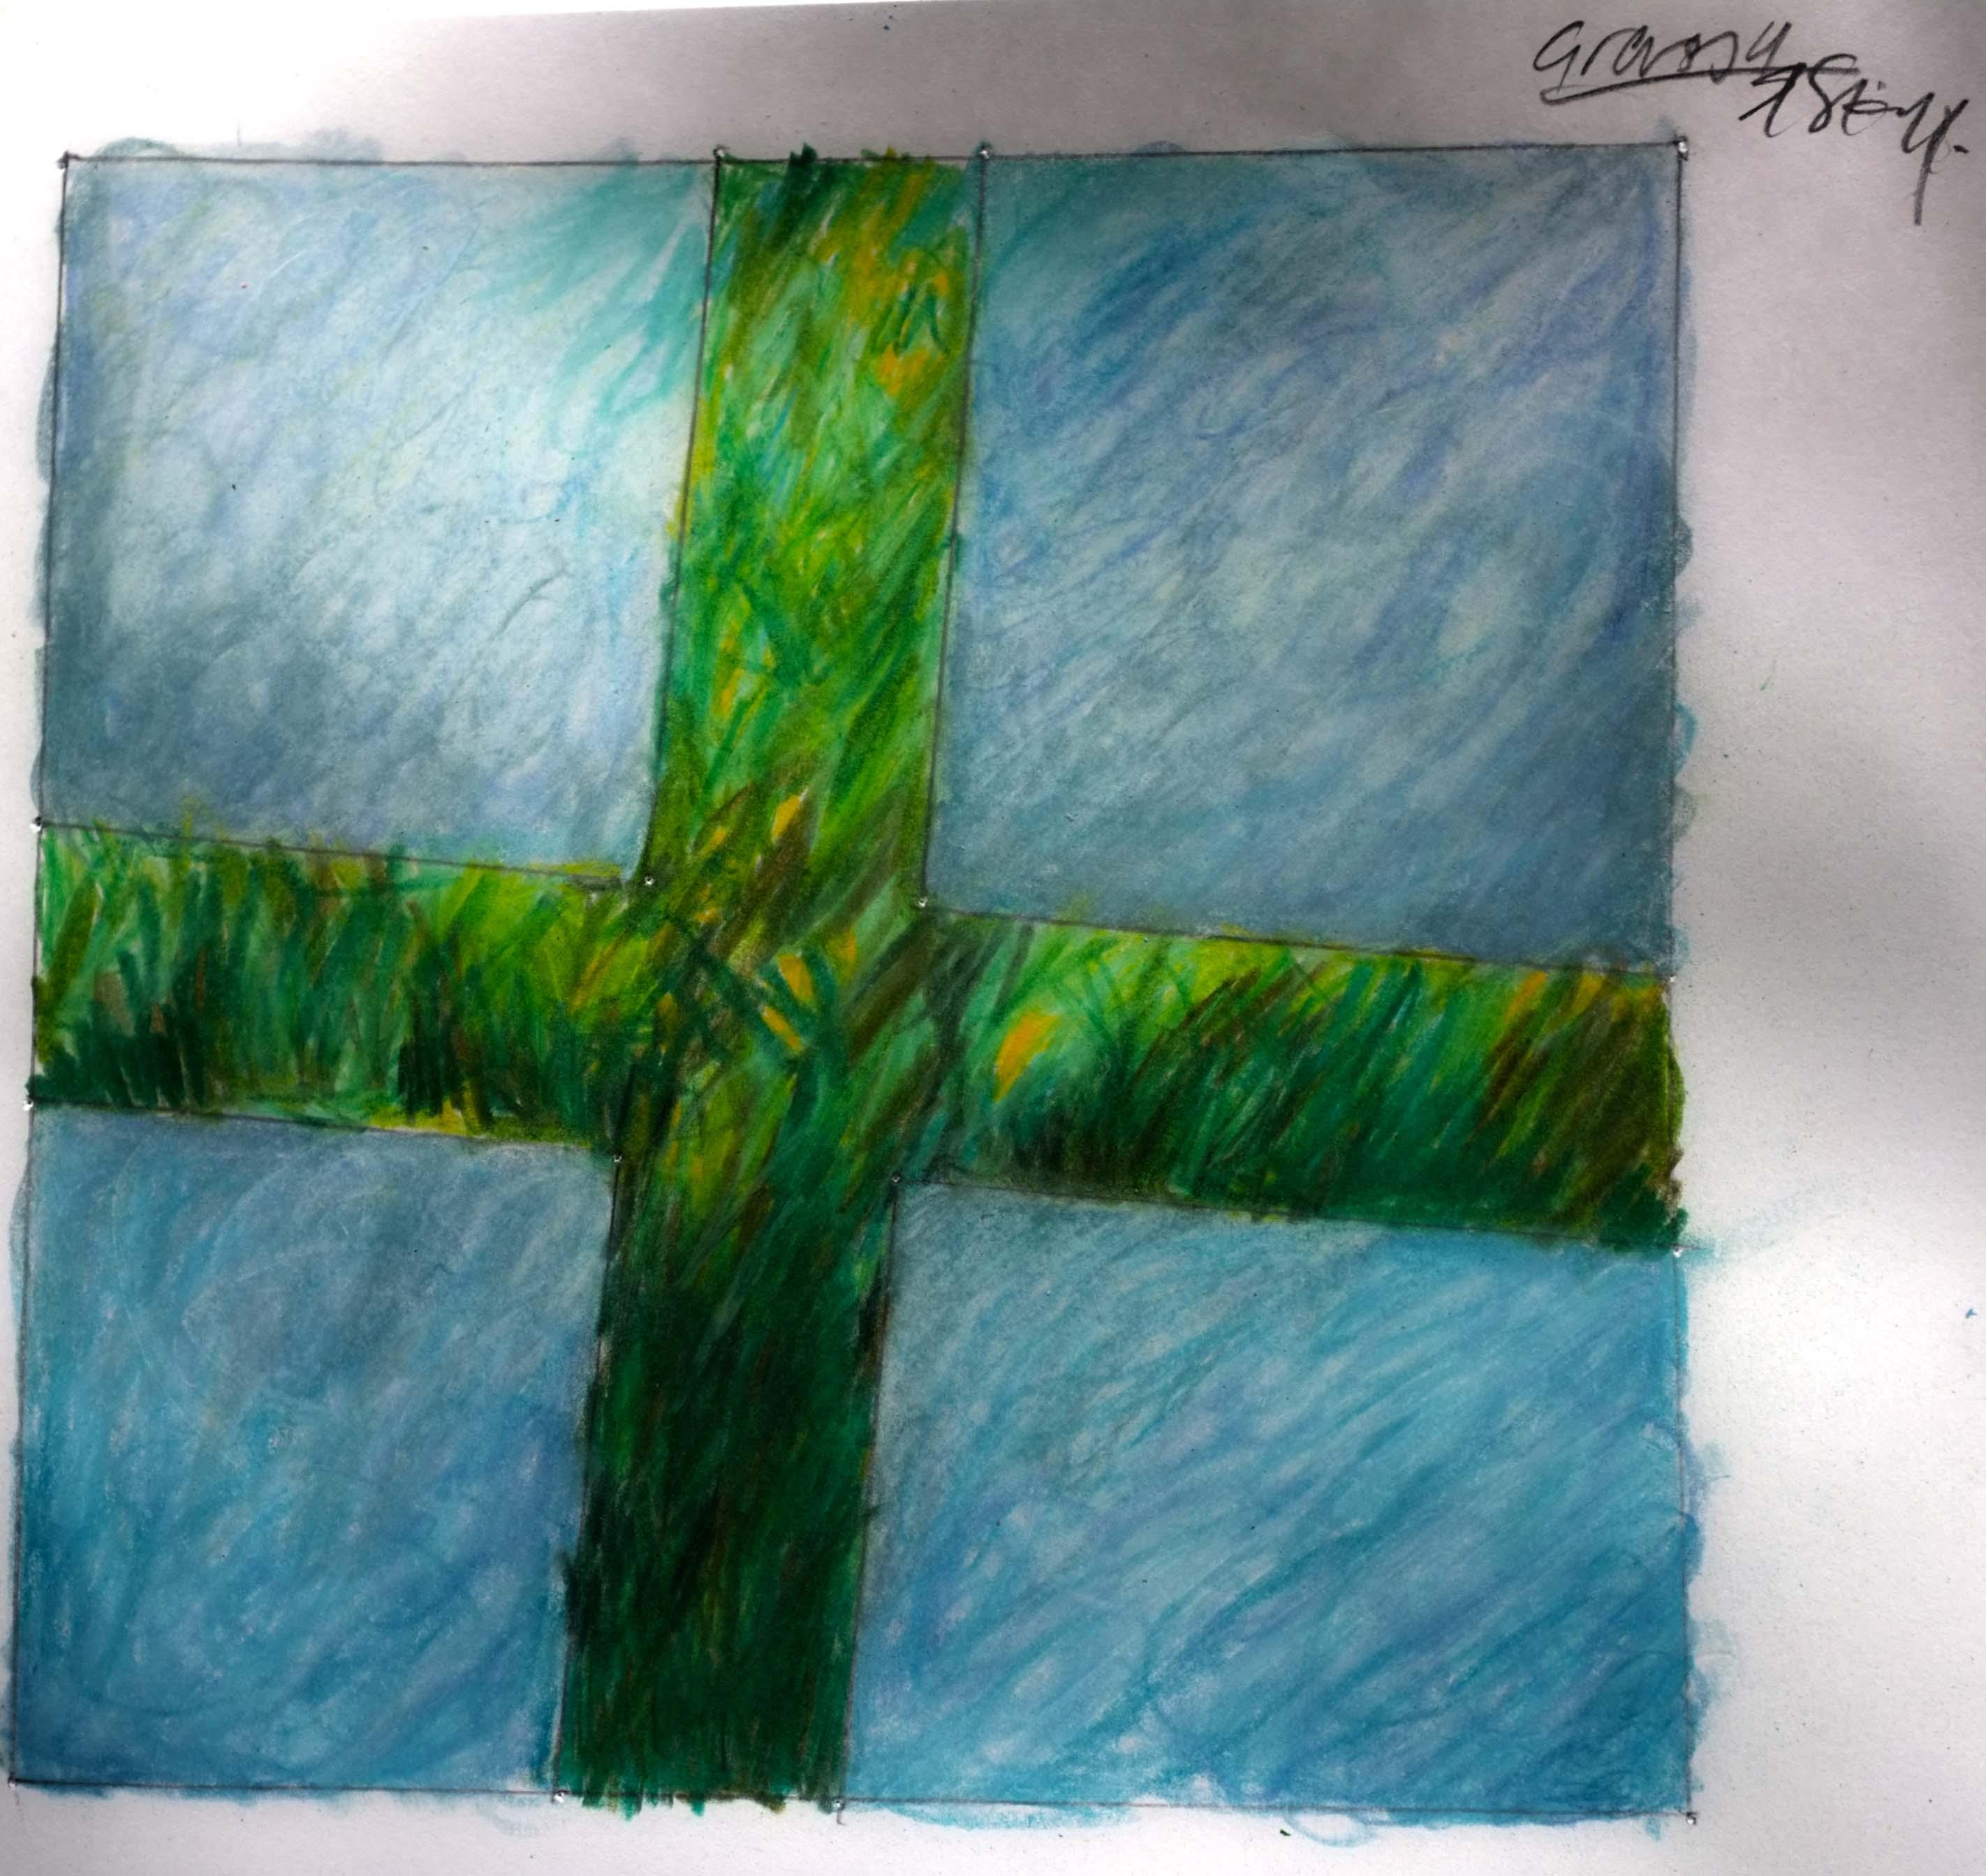 Graden drawing 2 grass and sky DSCF3570